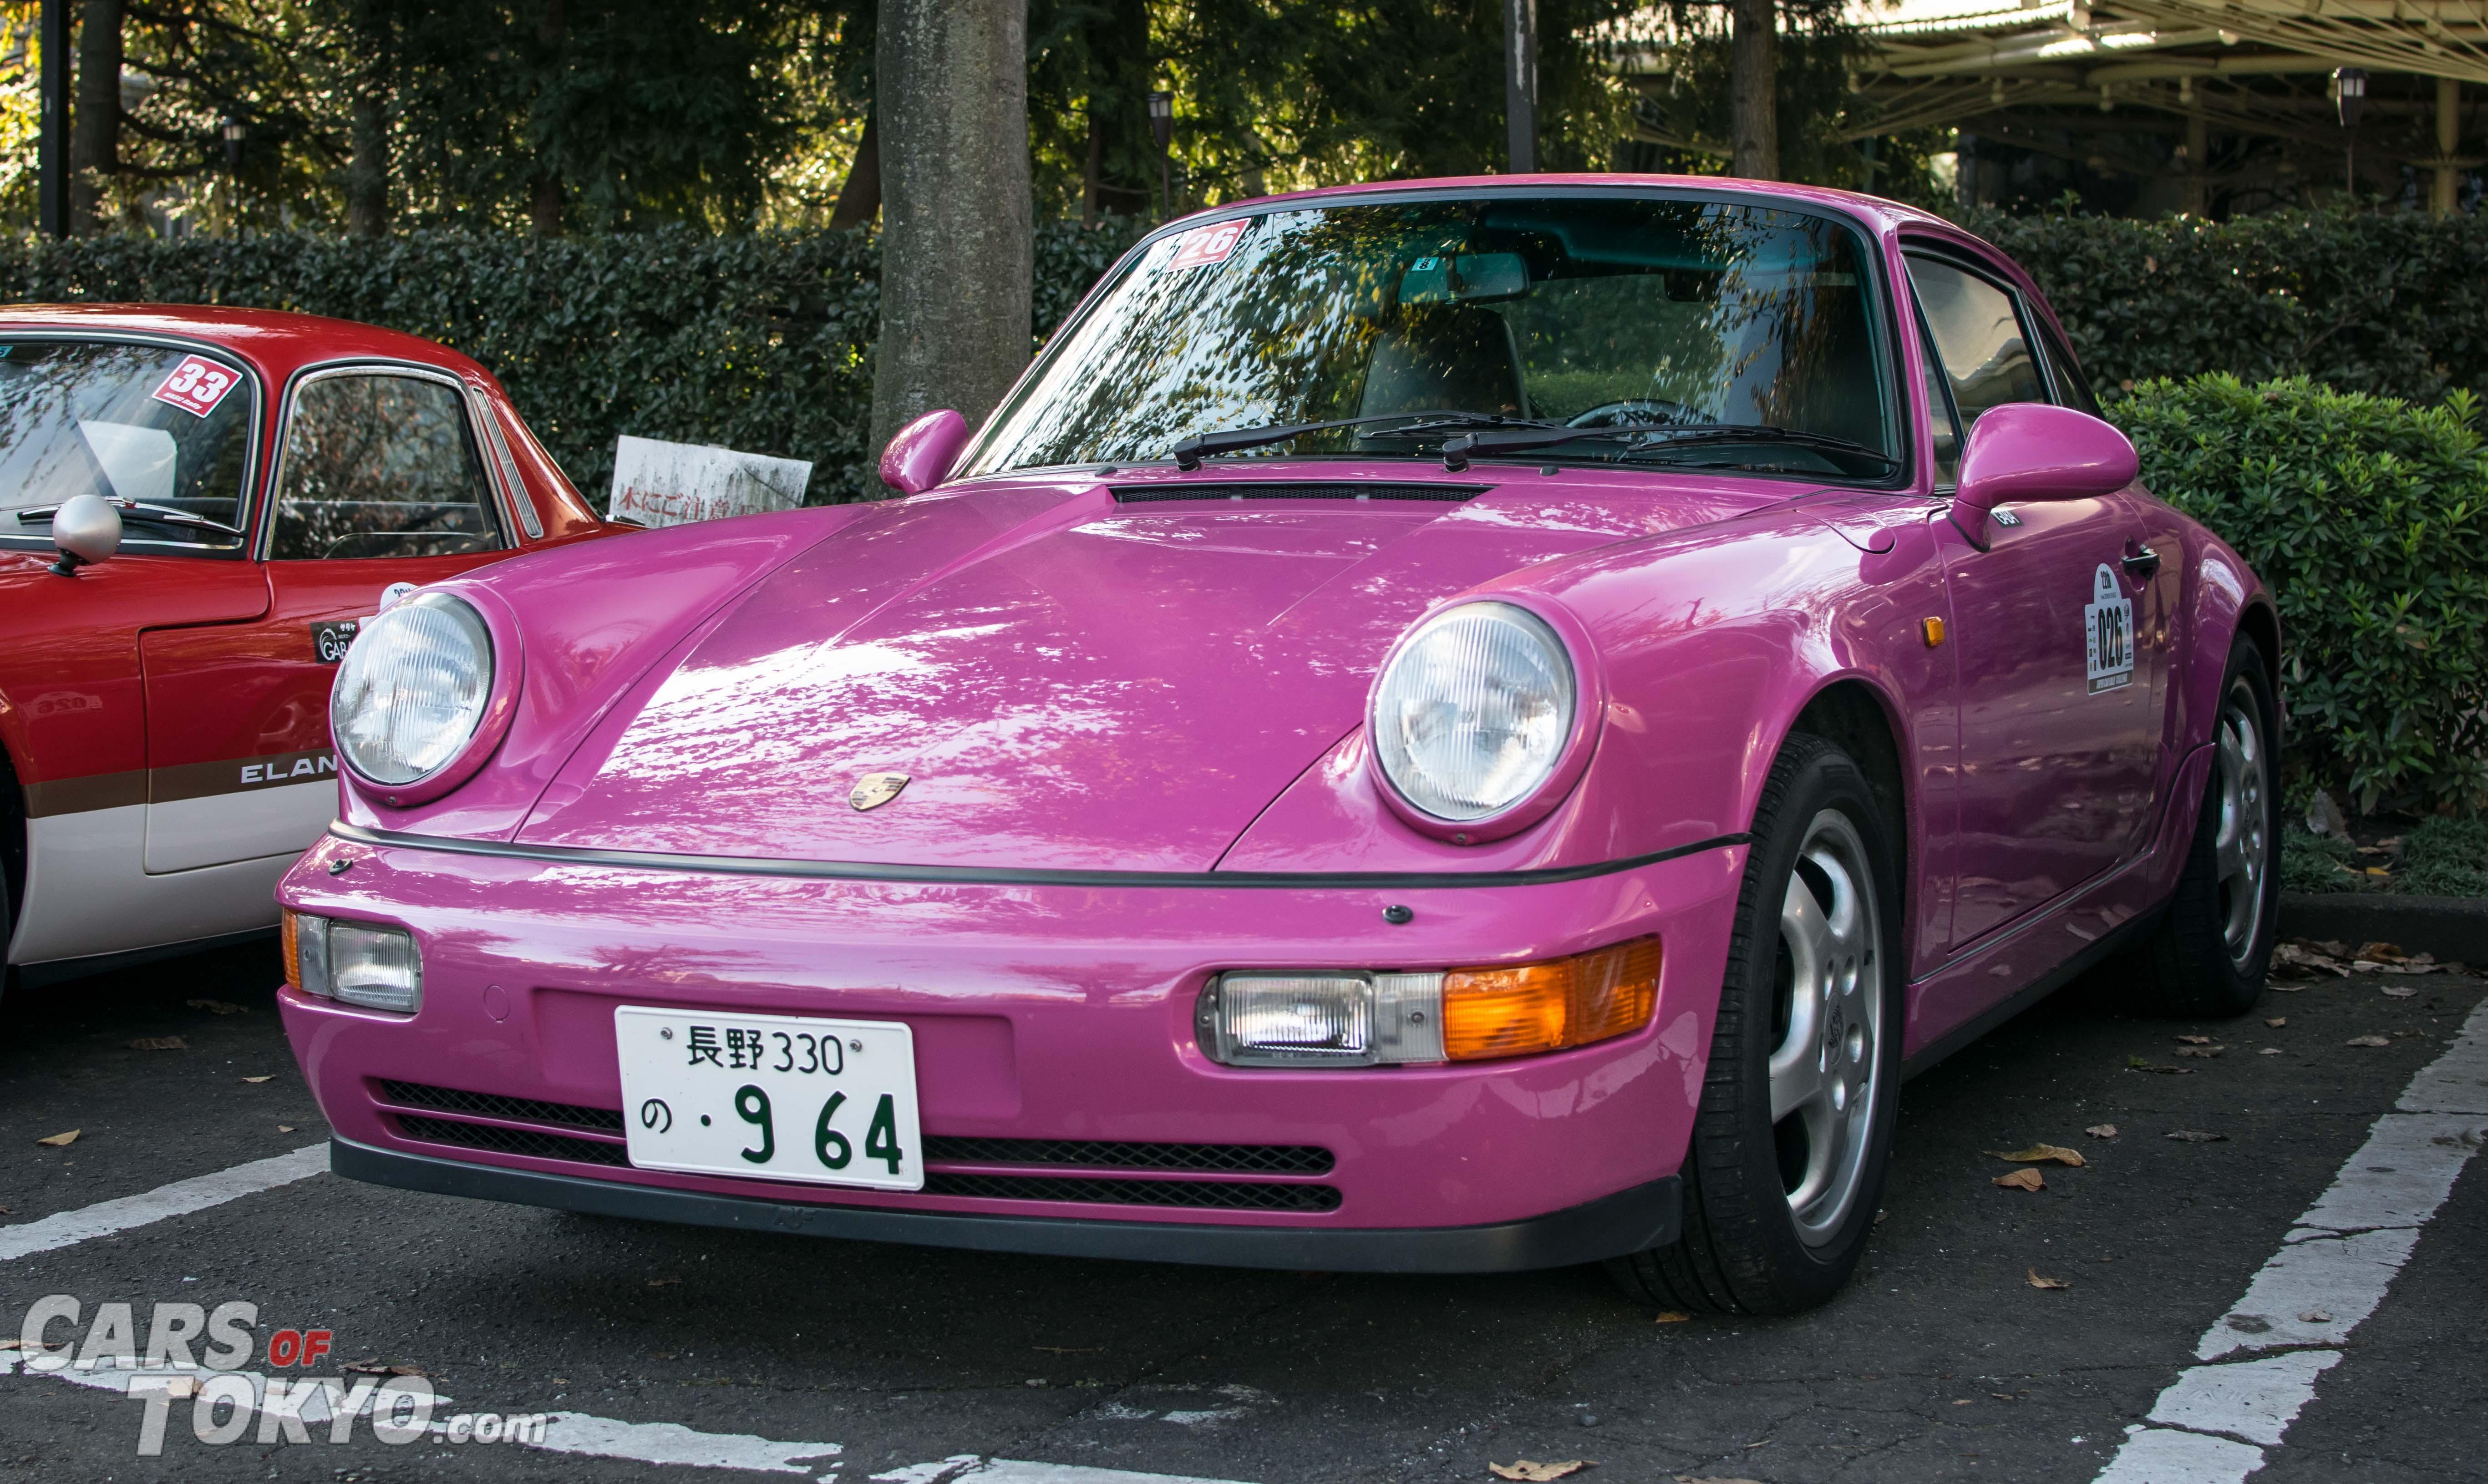 Cars of Tokyo Porsche 911 Carrera 2